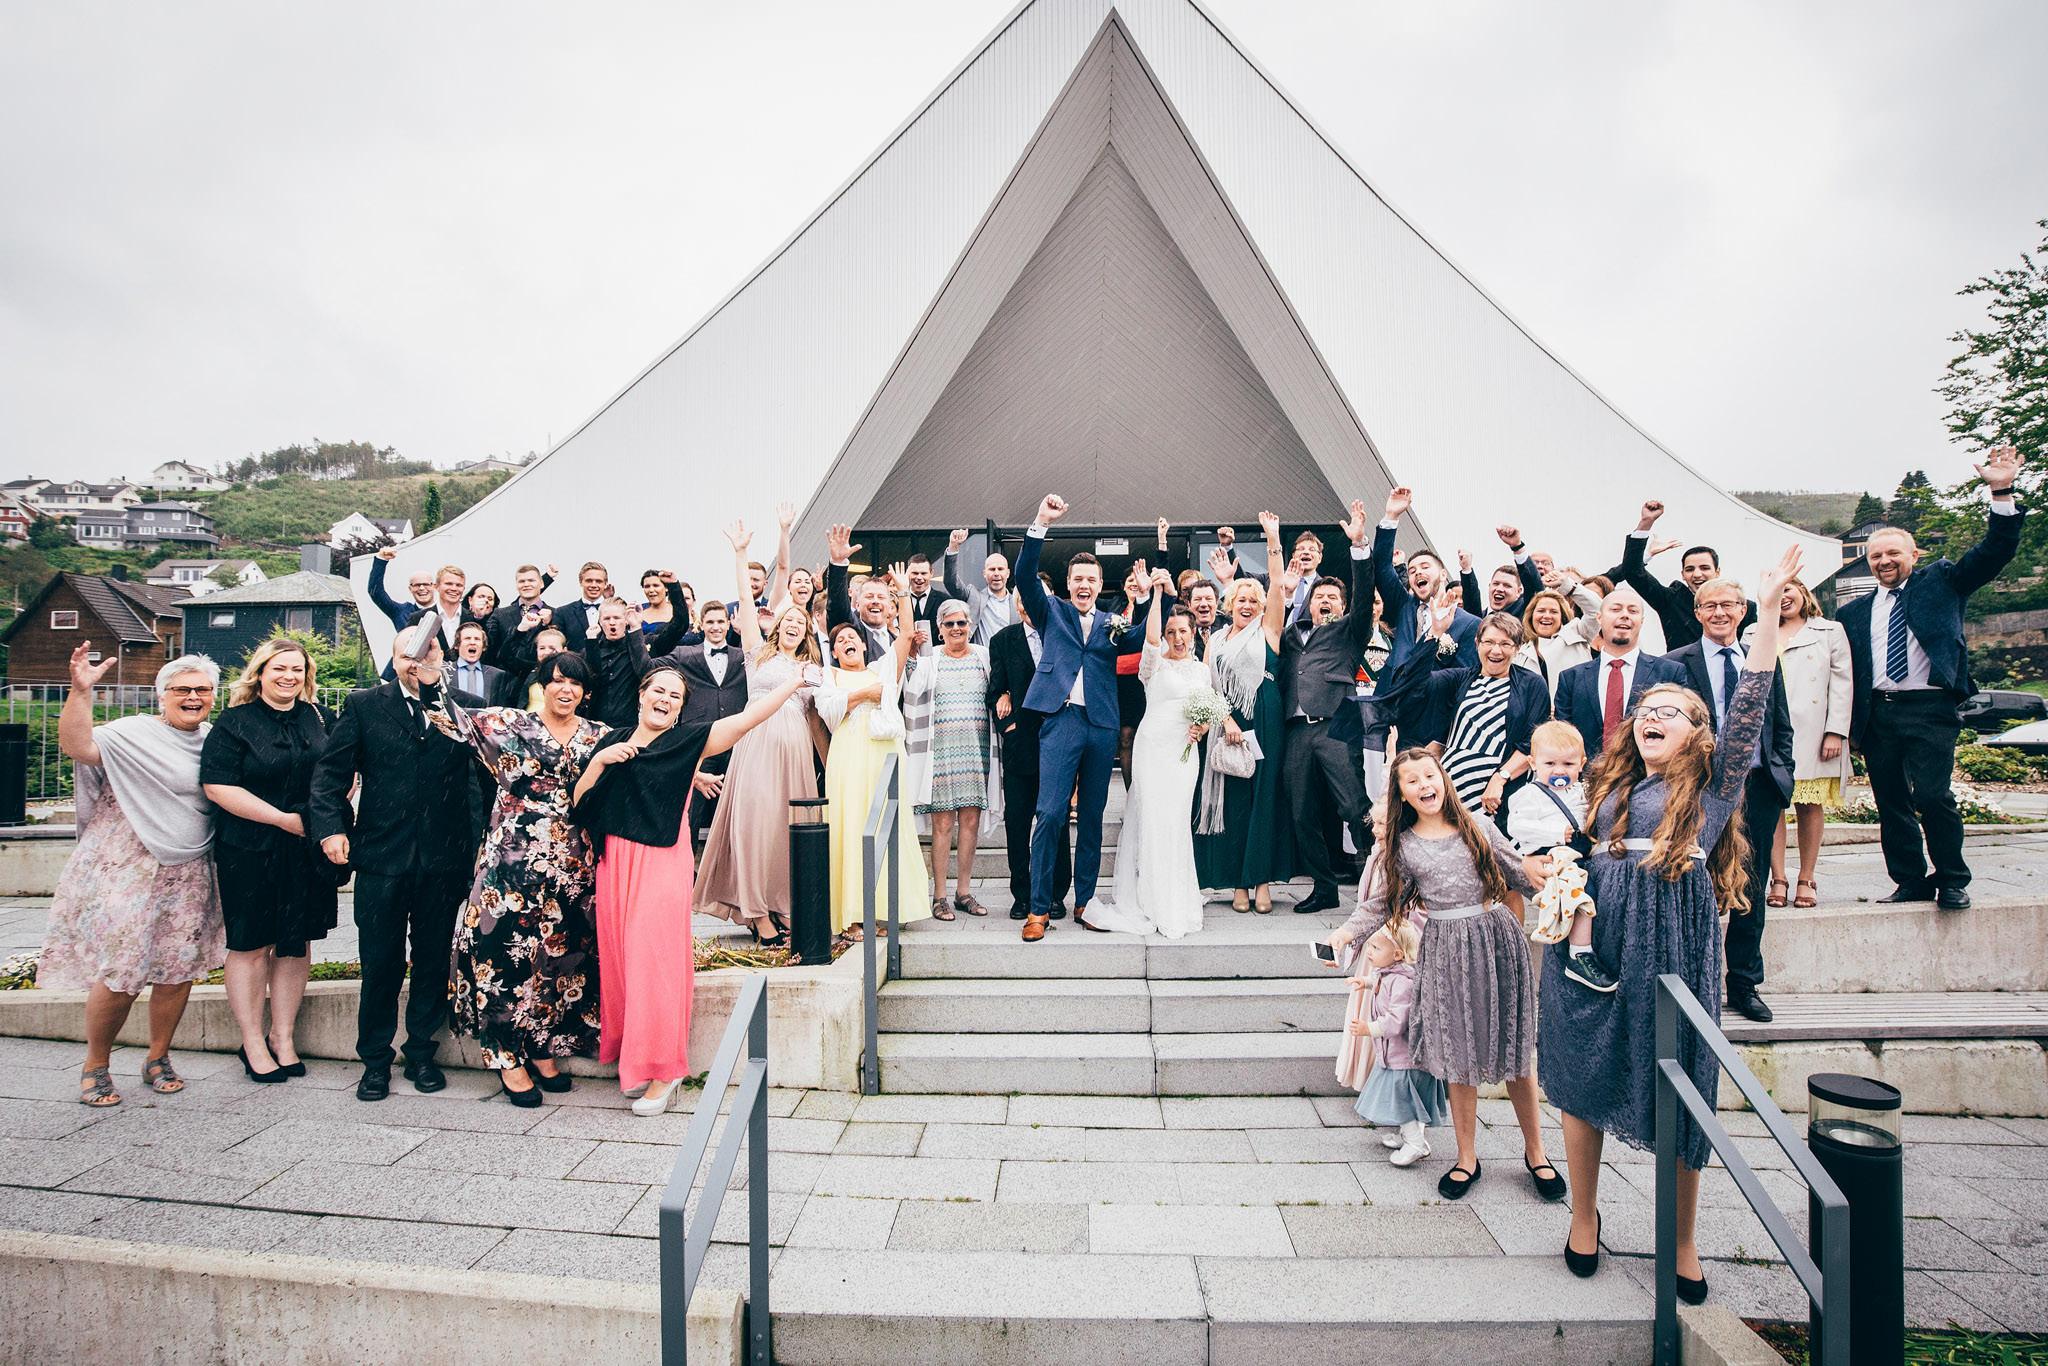 Norway+wedding+photographer+elopement+pre+wedding+Casey+Arneson-49.jpg